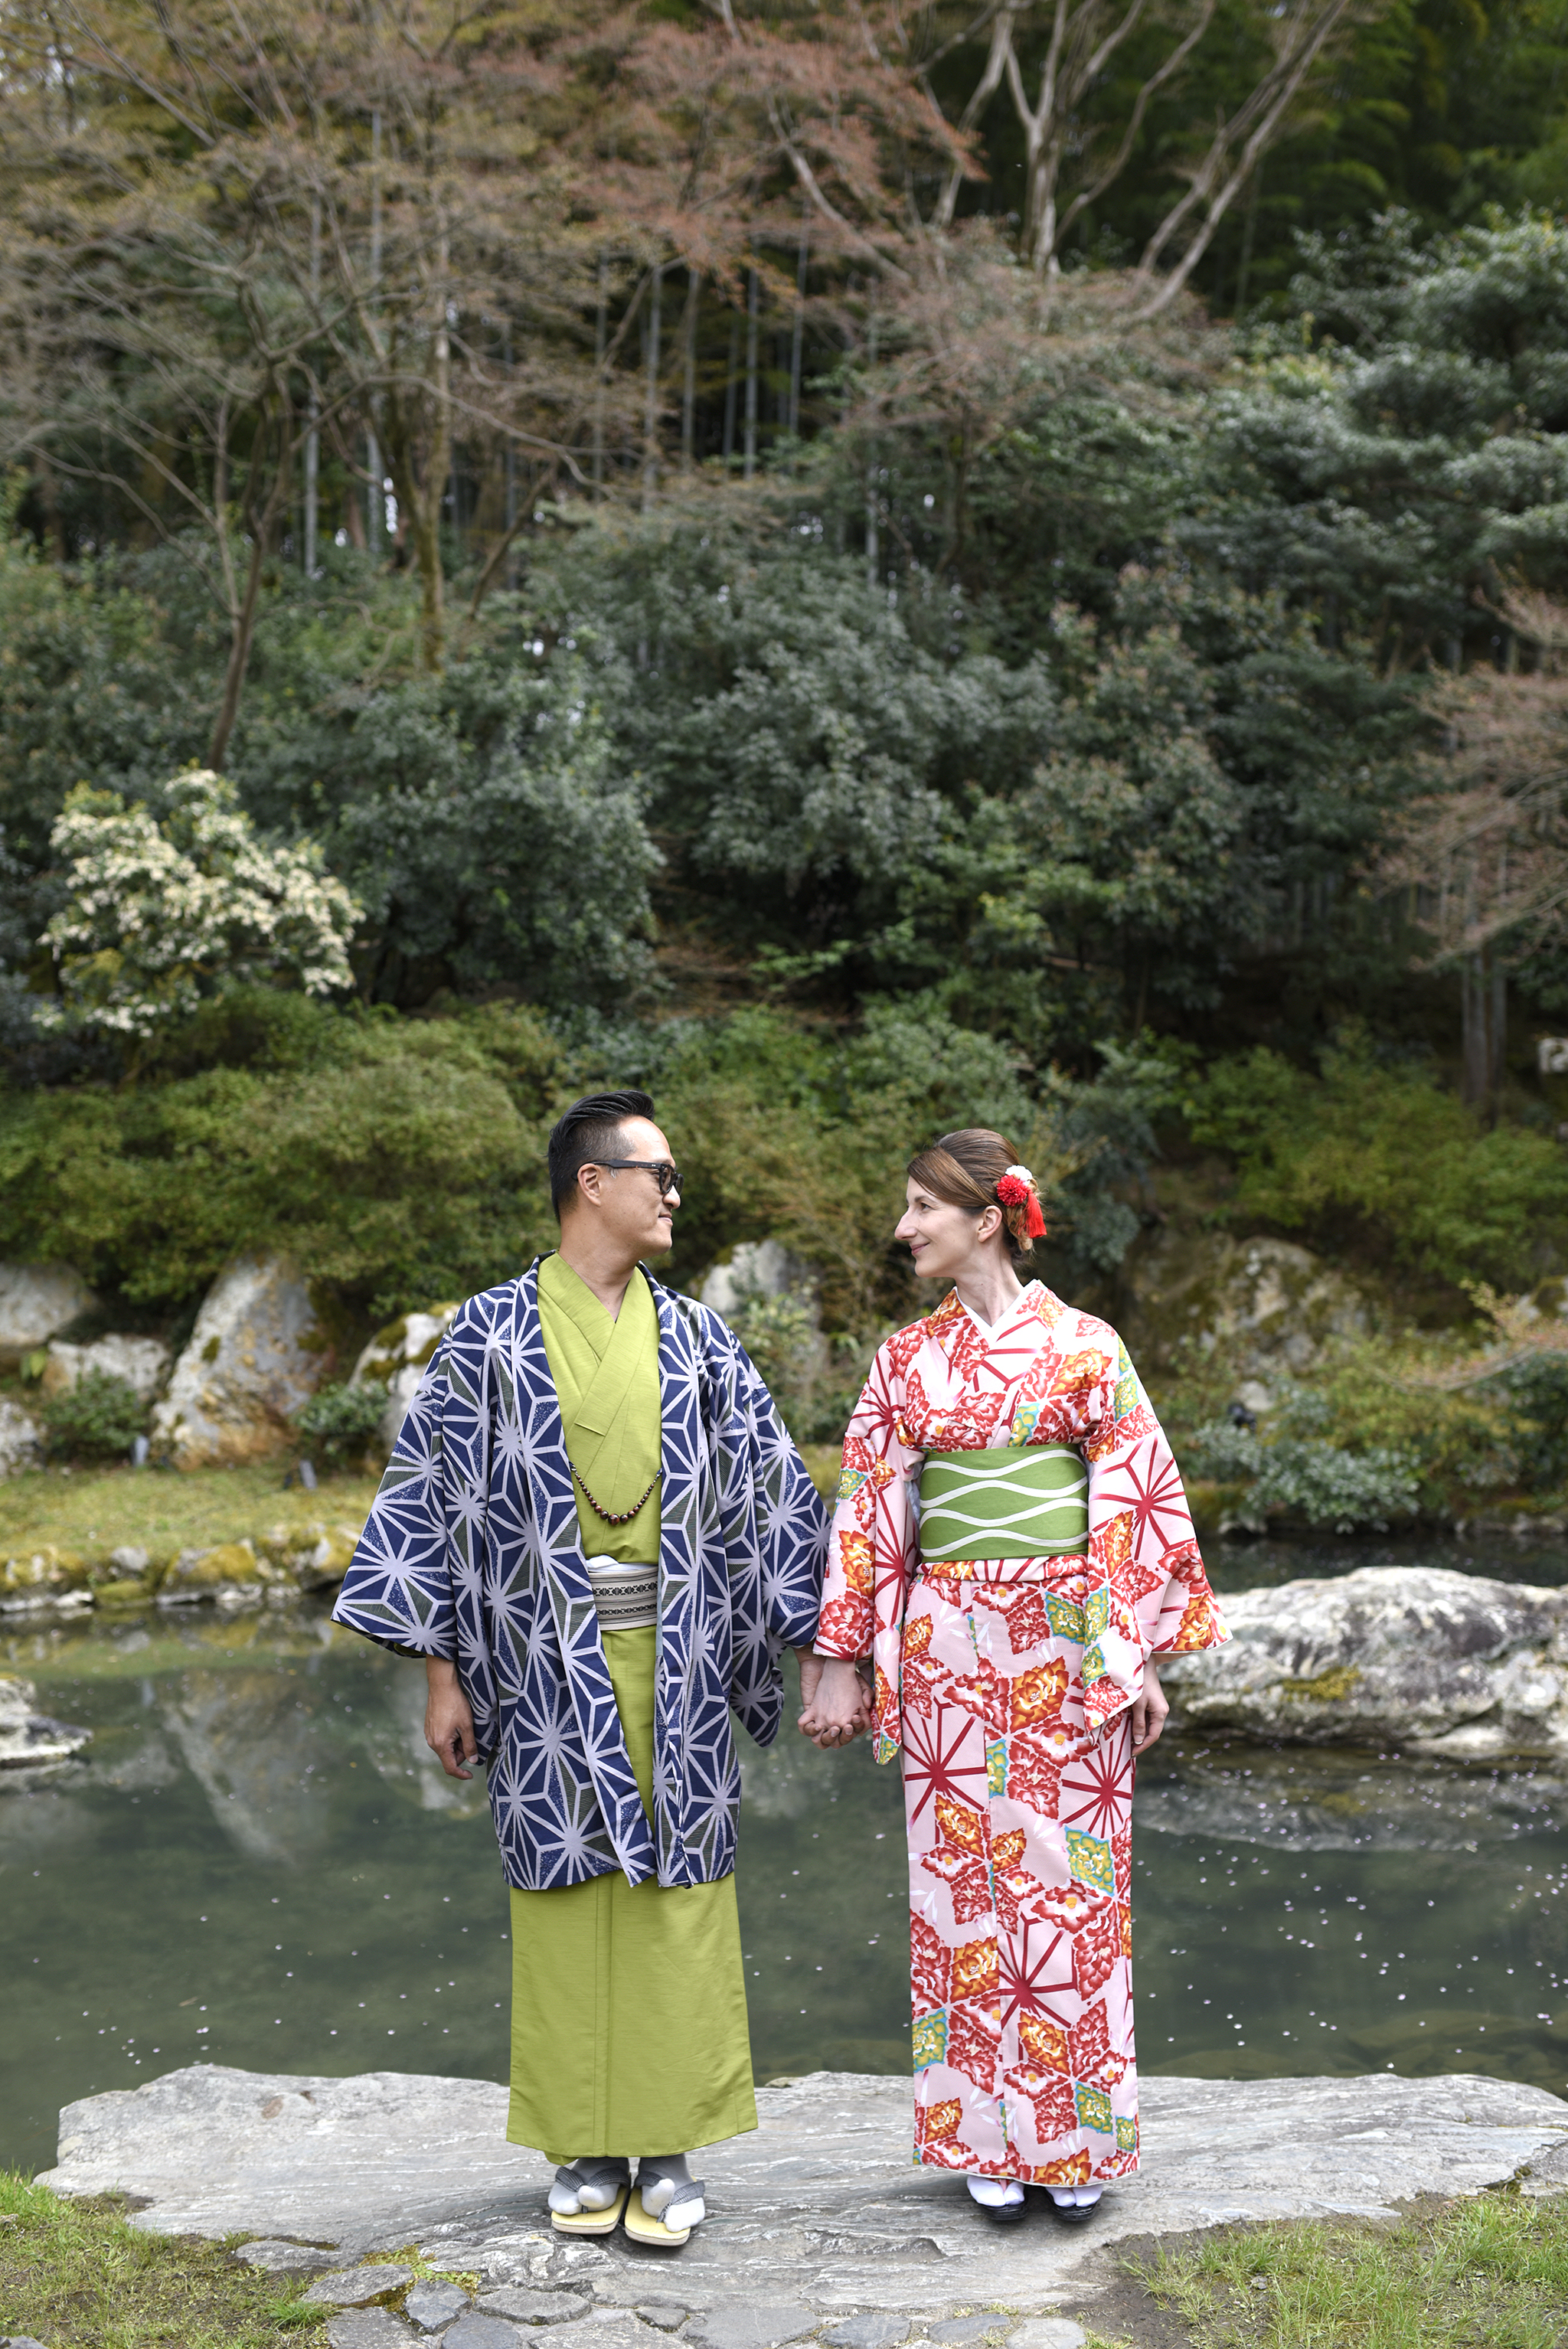 Kimono Rental Guide Kyoto This Life Of Travel